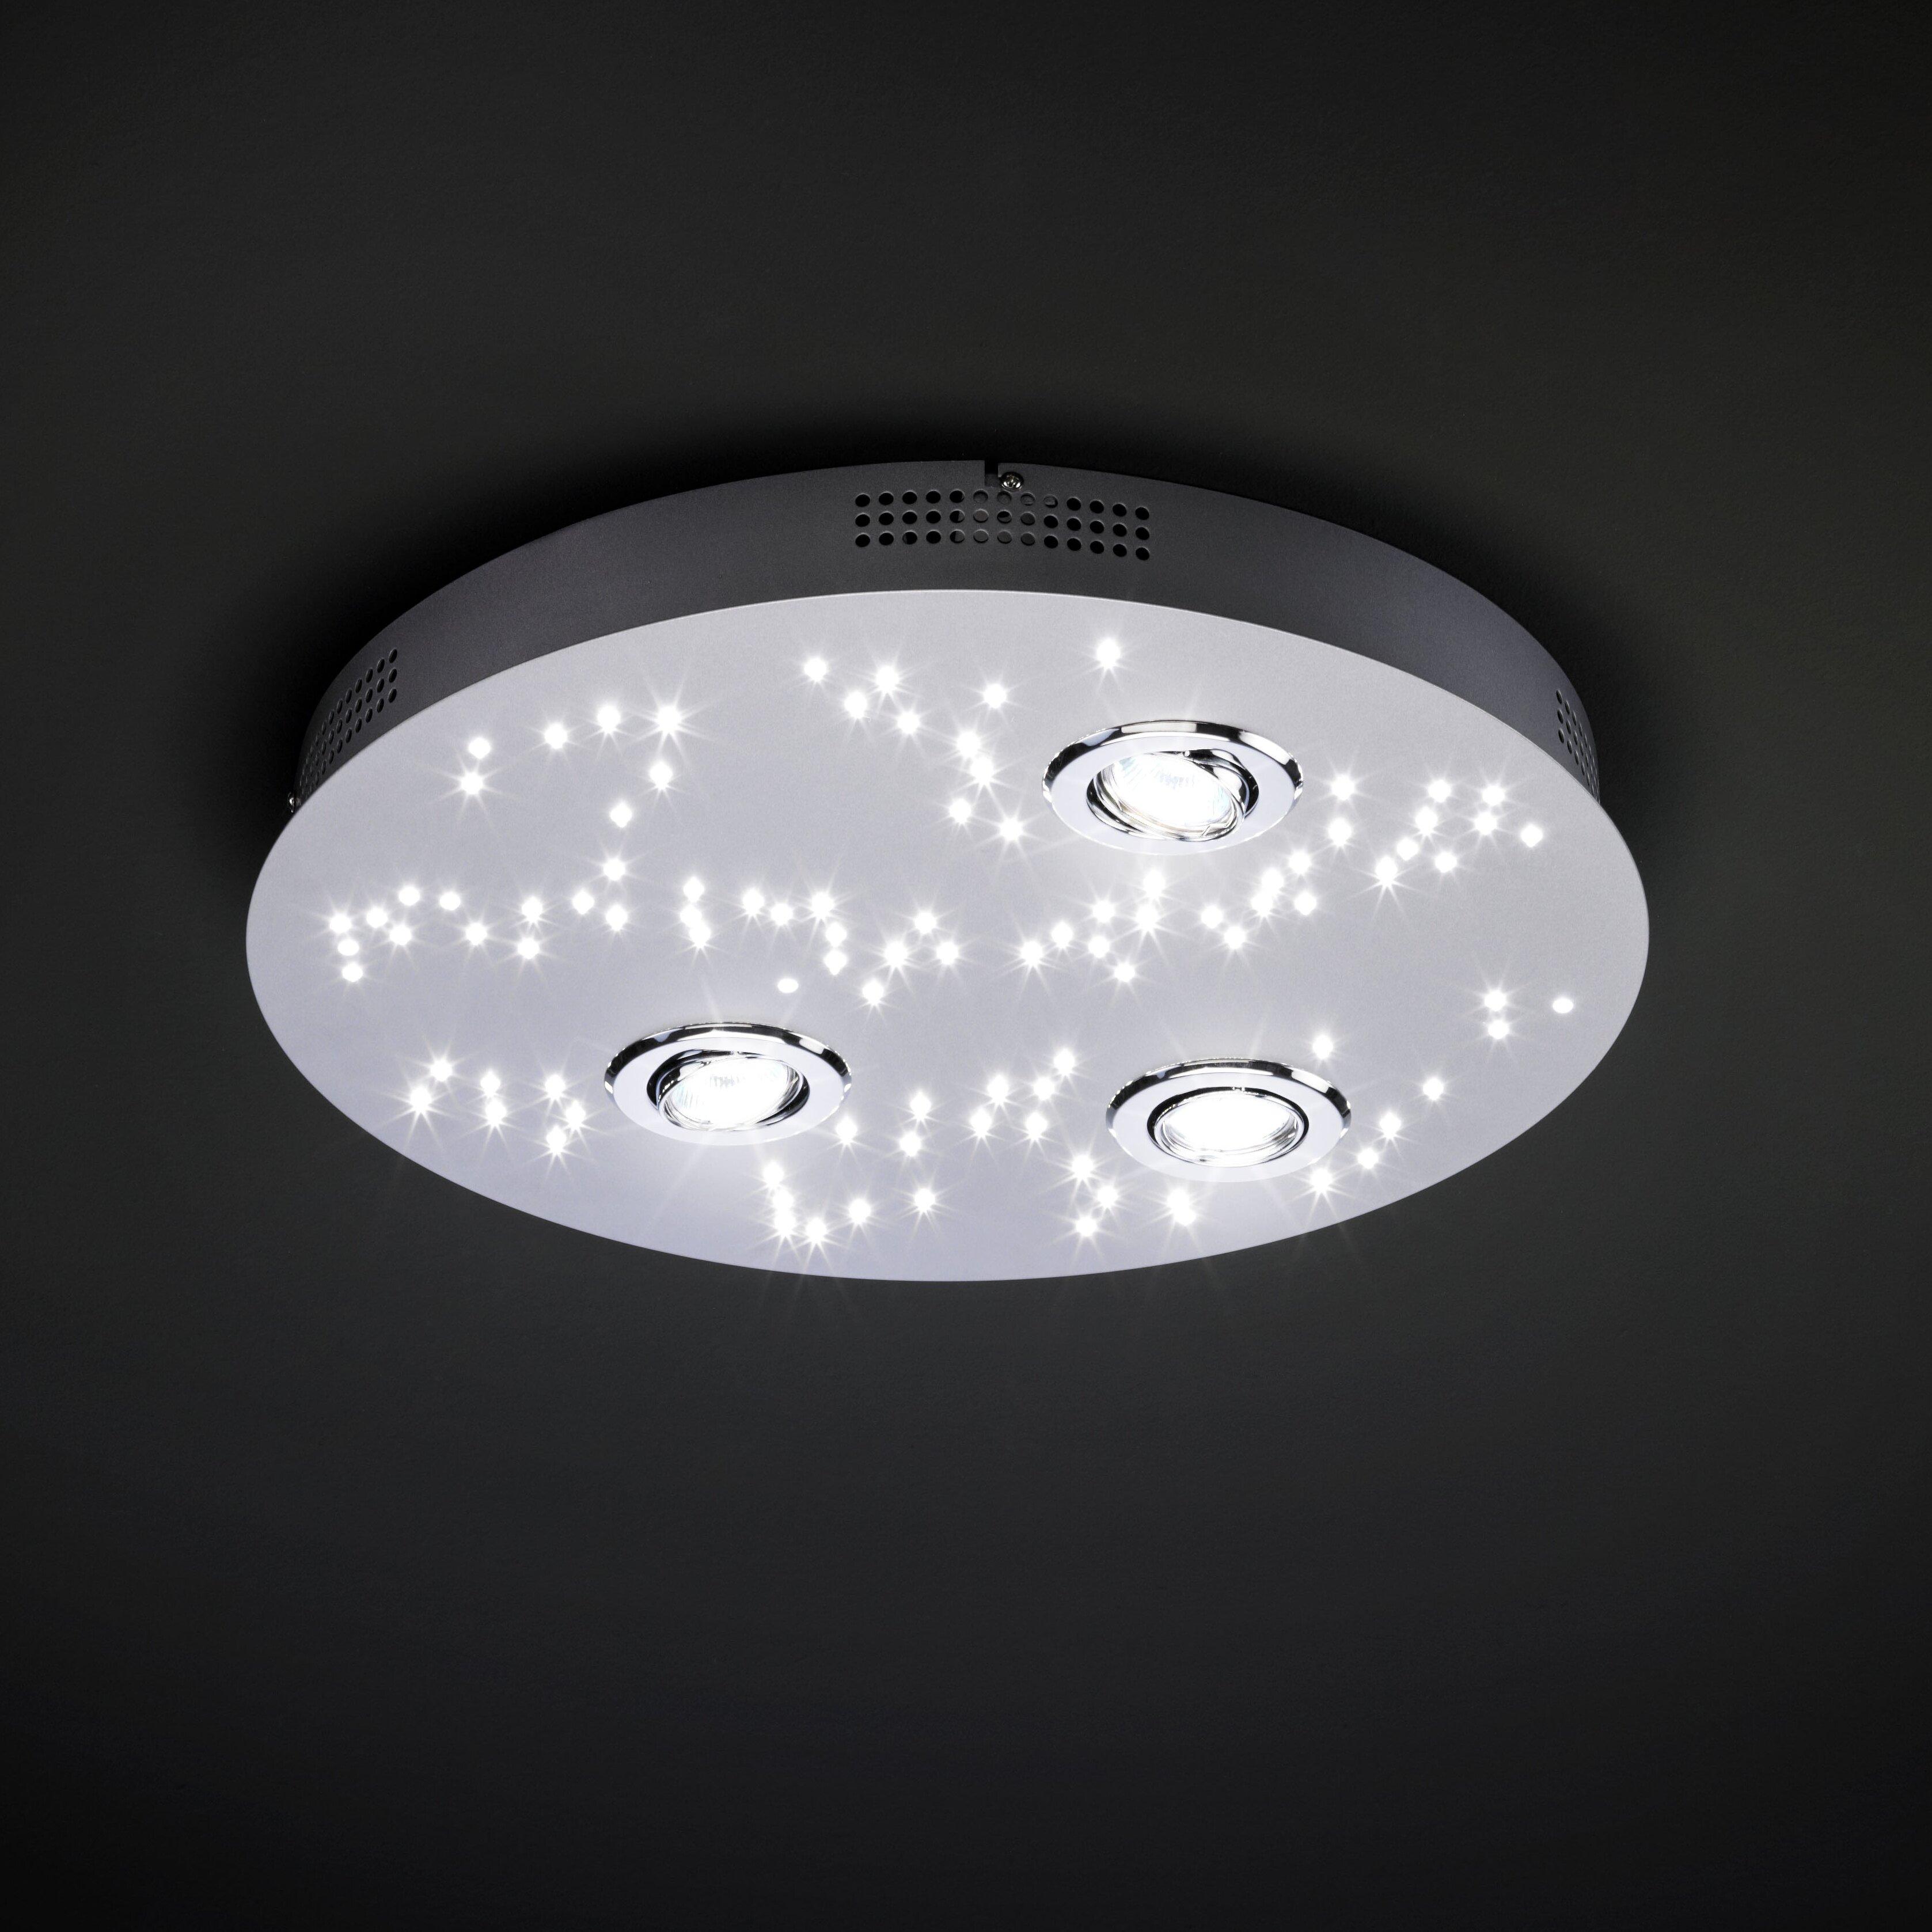 paul neuhaus night sky 103 light flush ceiling light reviews wayfair uk. Black Bedroom Furniture Sets. Home Design Ideas